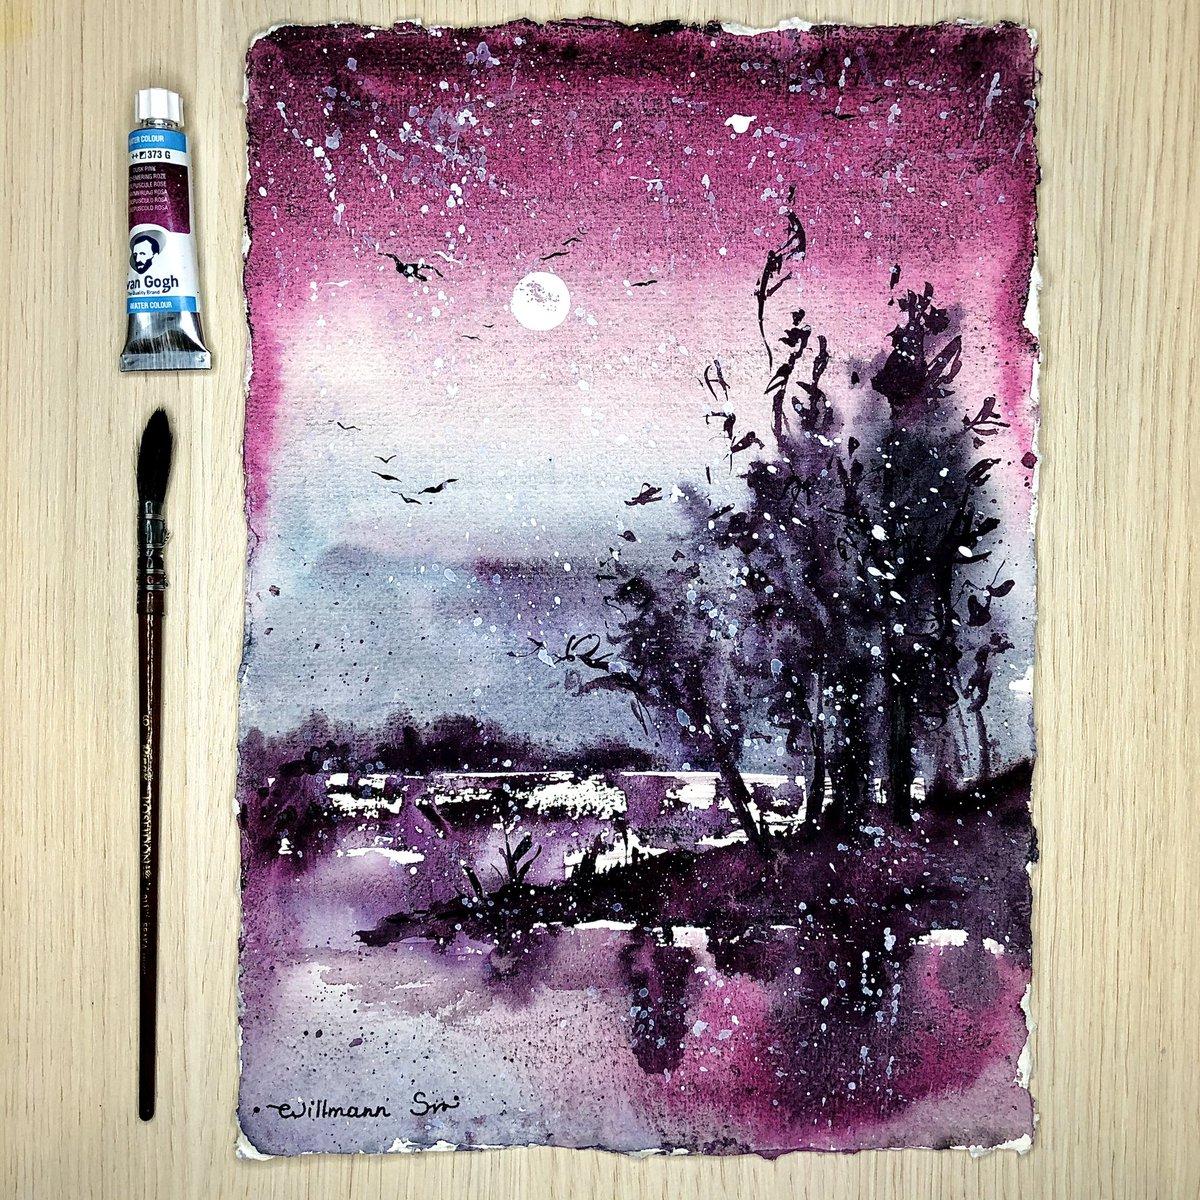 "Uživatel Wittmann Svetlana na Twitteru: ""🔮 Magical granulation watercolor  by Van Gogh🔮 (Dusk pink) and I love that handmade Khadi paper 💗 🧙♀️  Snowing 🌨 . #Watercolor #Watercolourpainting #Watercolour #art #painting  #artwork…"